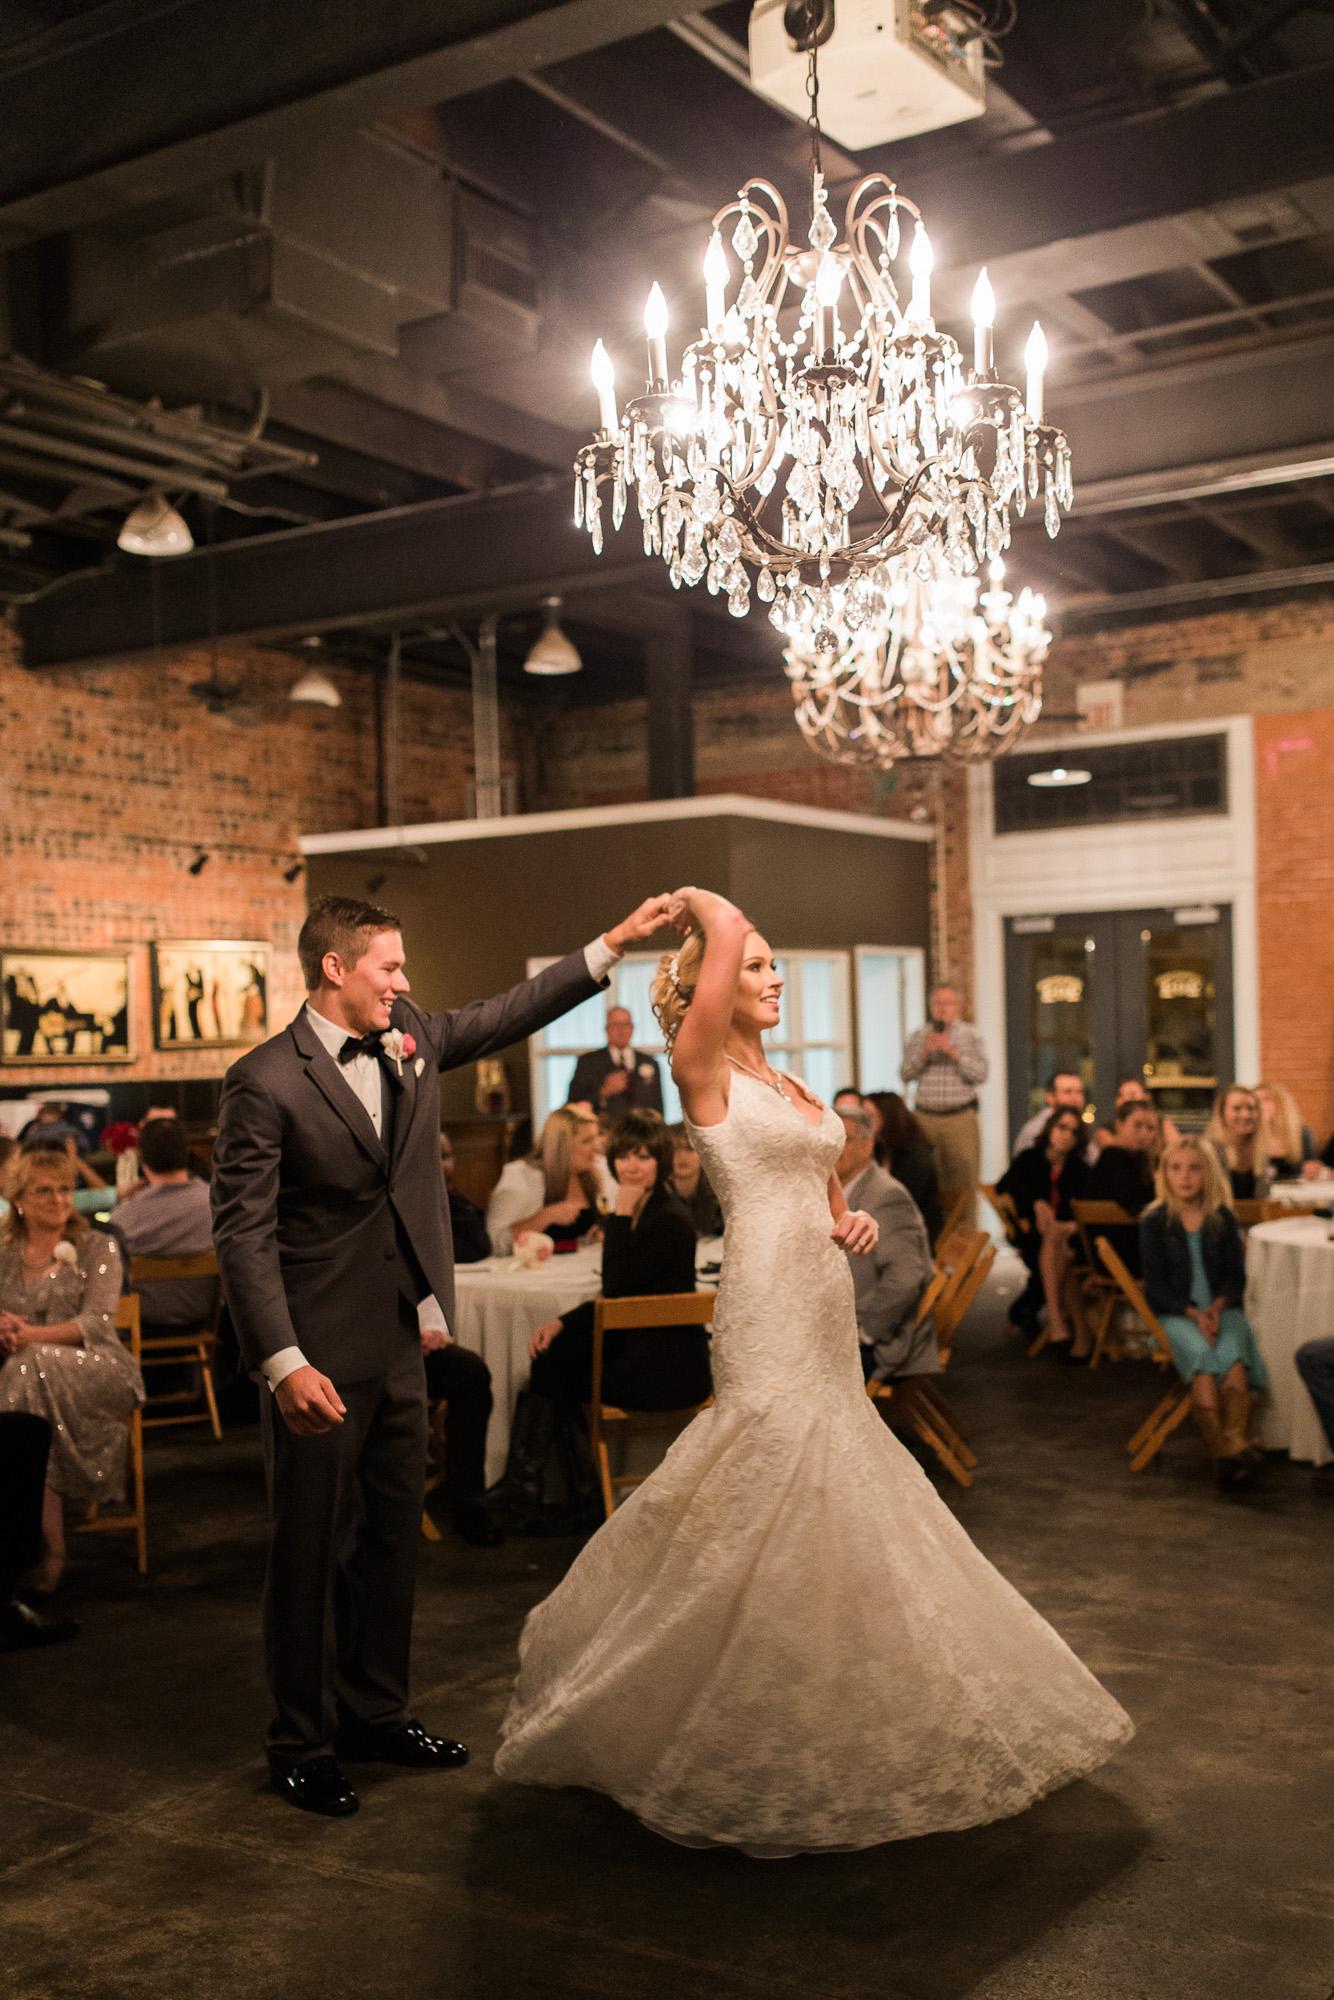 f0483-downtown-bryan-weddingdowntown-bryan-wedding.jpg